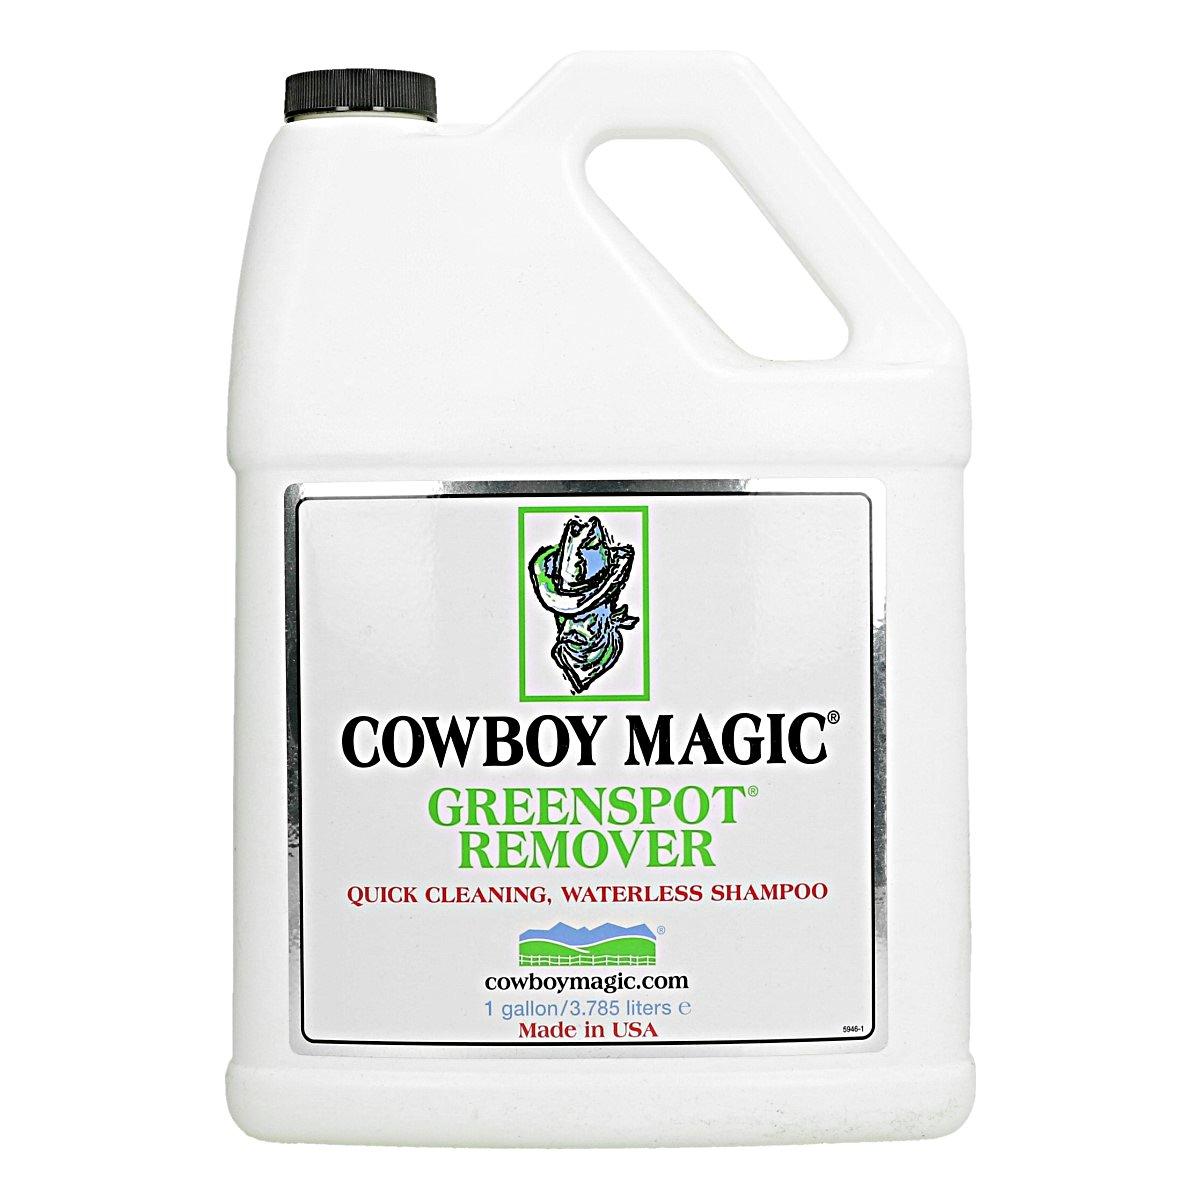 Afbeelding van Cowboy Magic Greenspot Remover 3785ml